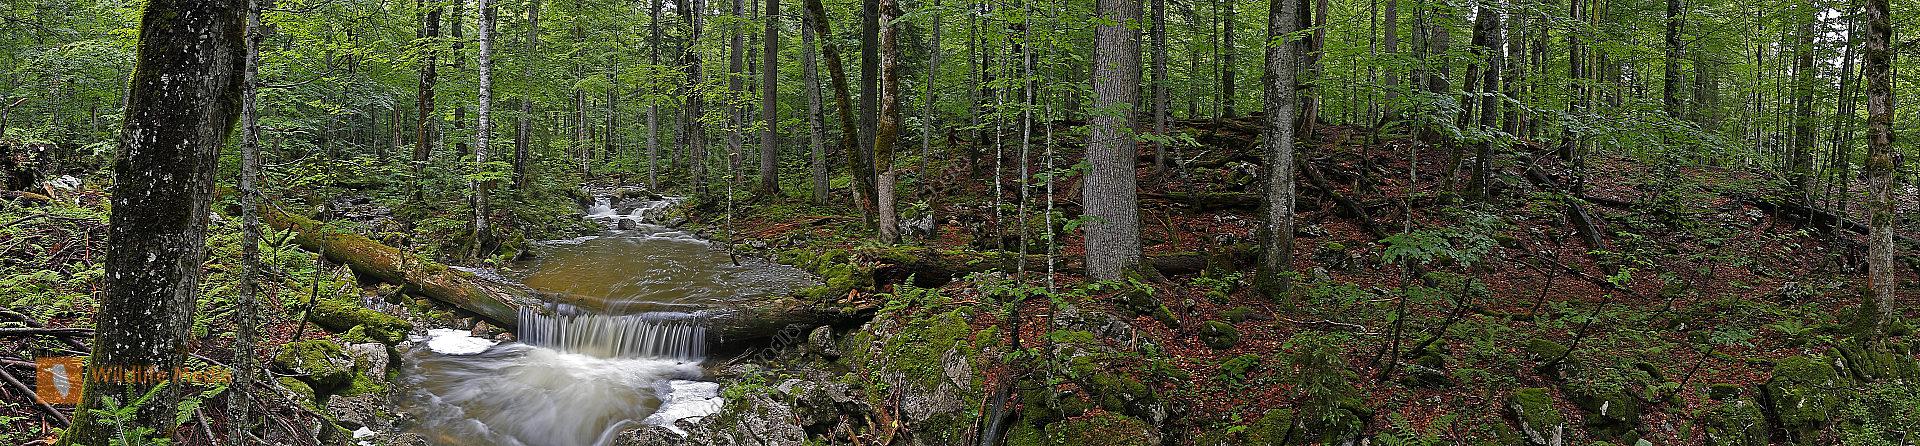 Großer Urwald Sommer Panorama